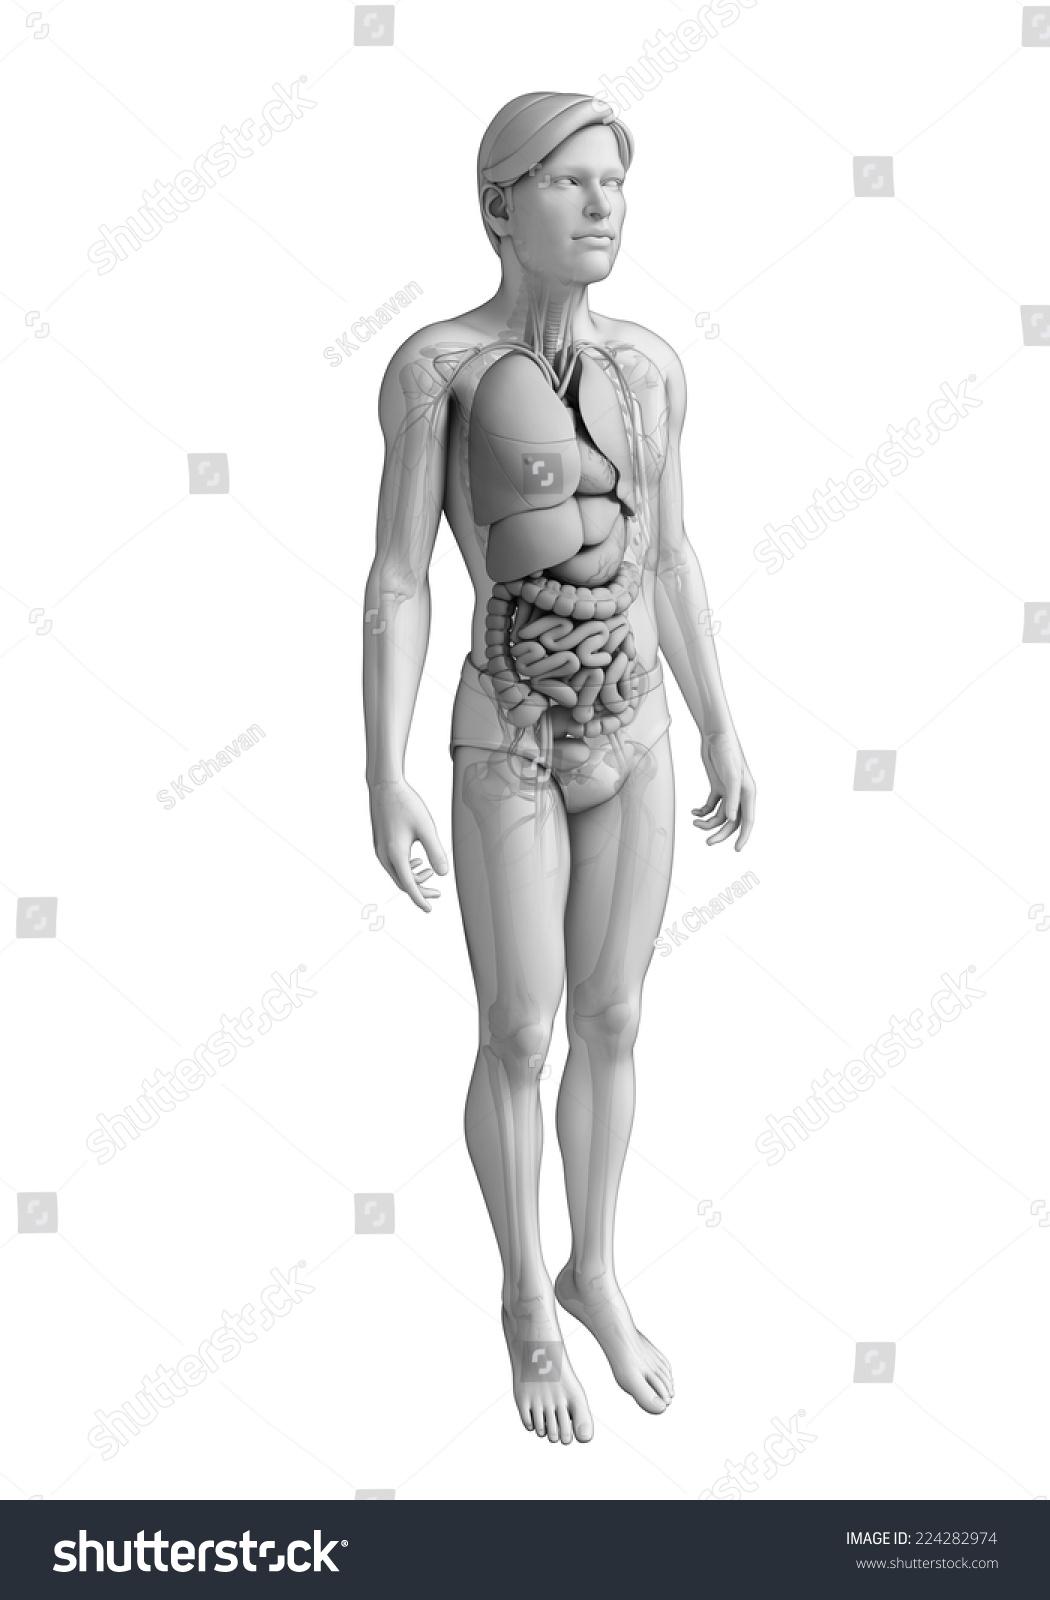 Illustration Male Digestive System Stock Illustration 224282974 ...